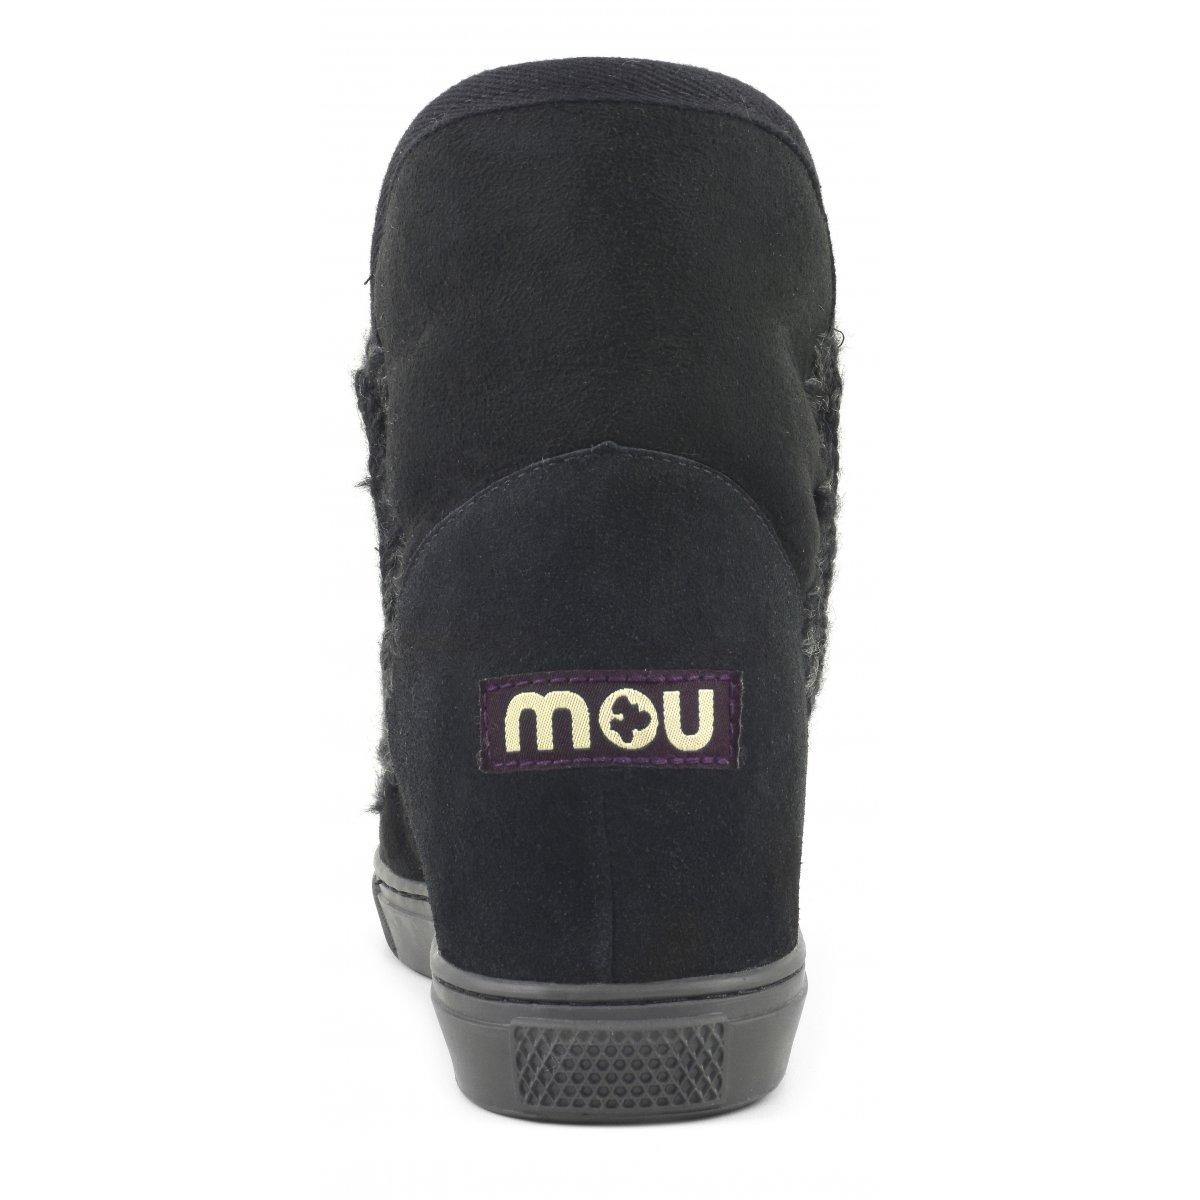 Mou Shoes Review